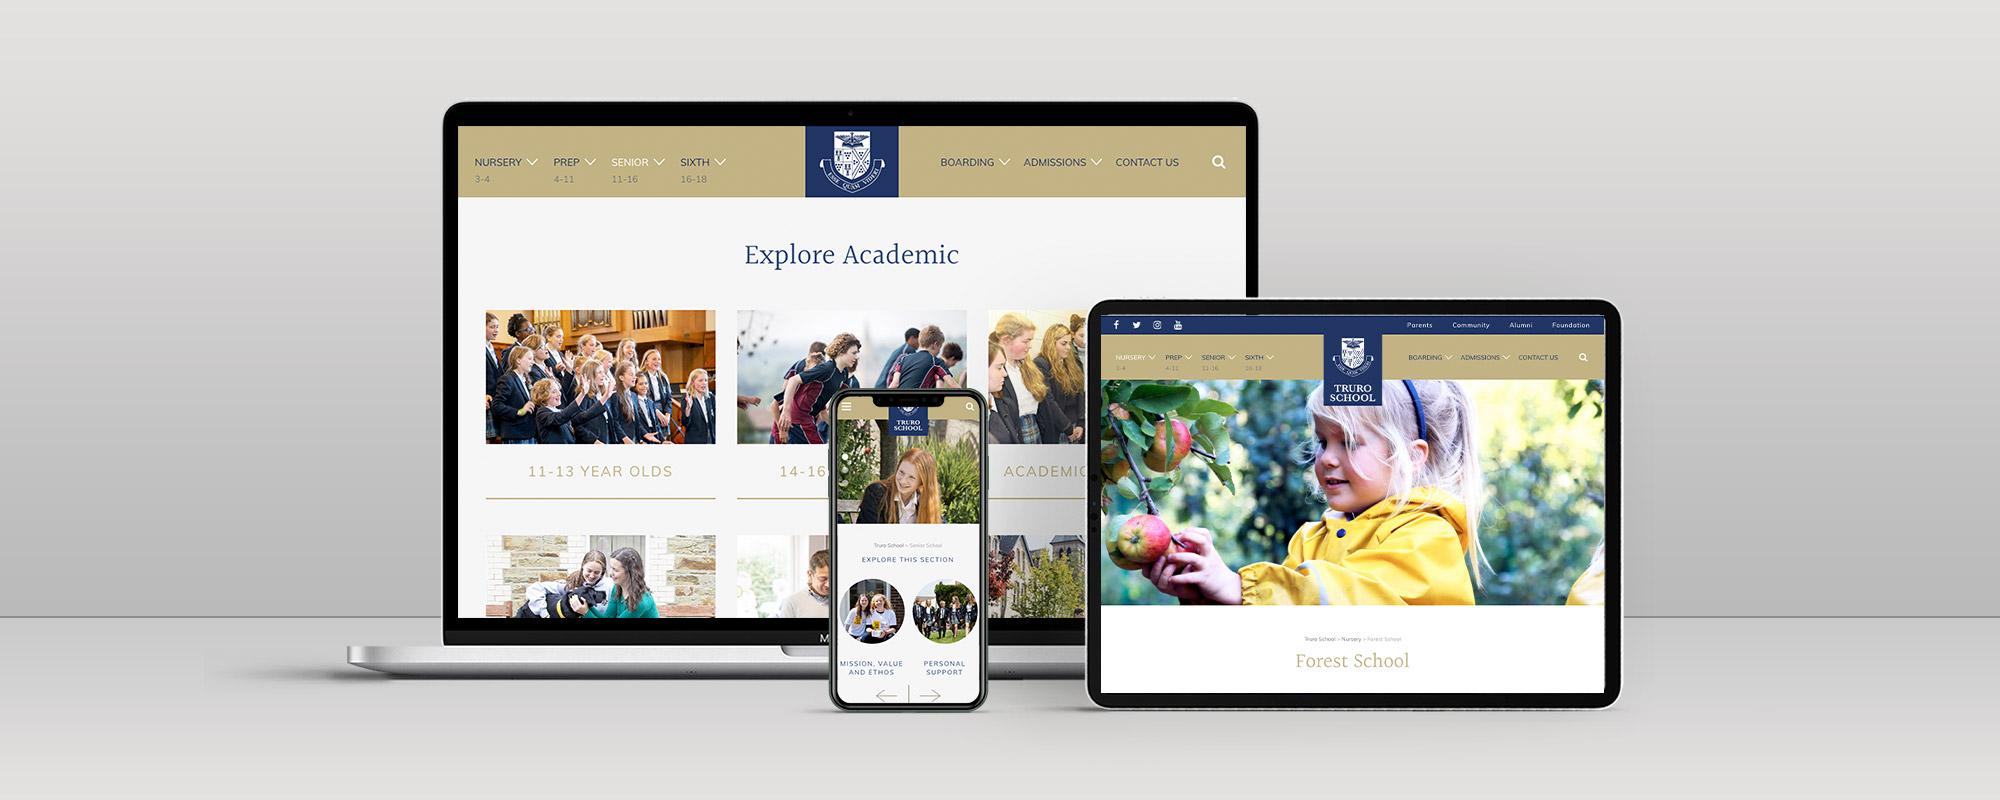 Truro School Wordpress Website on 3 Devices